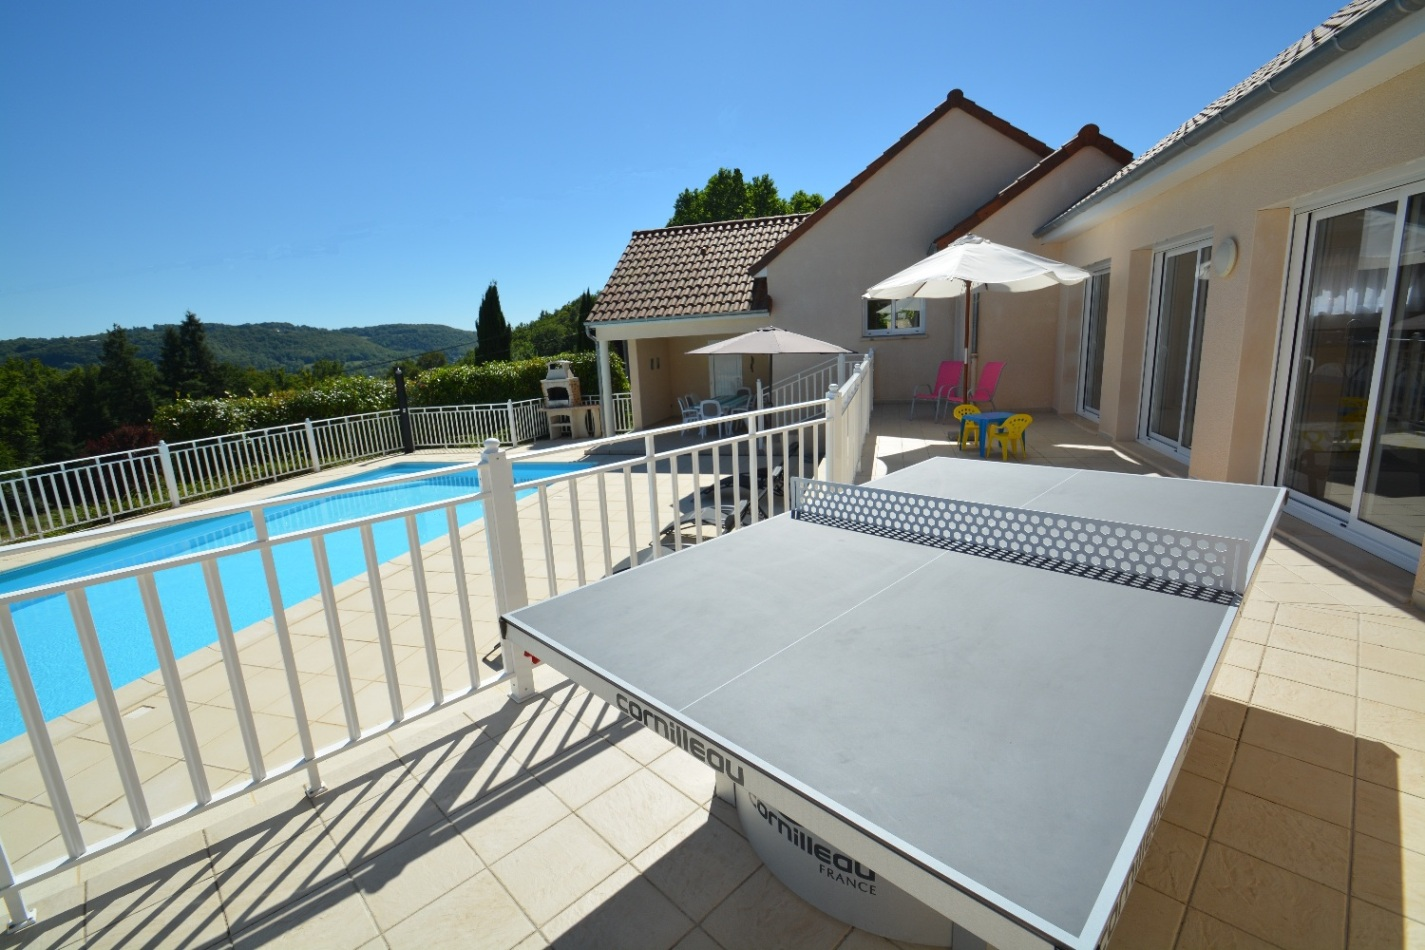 Grande terrasses avec table de ping-pong